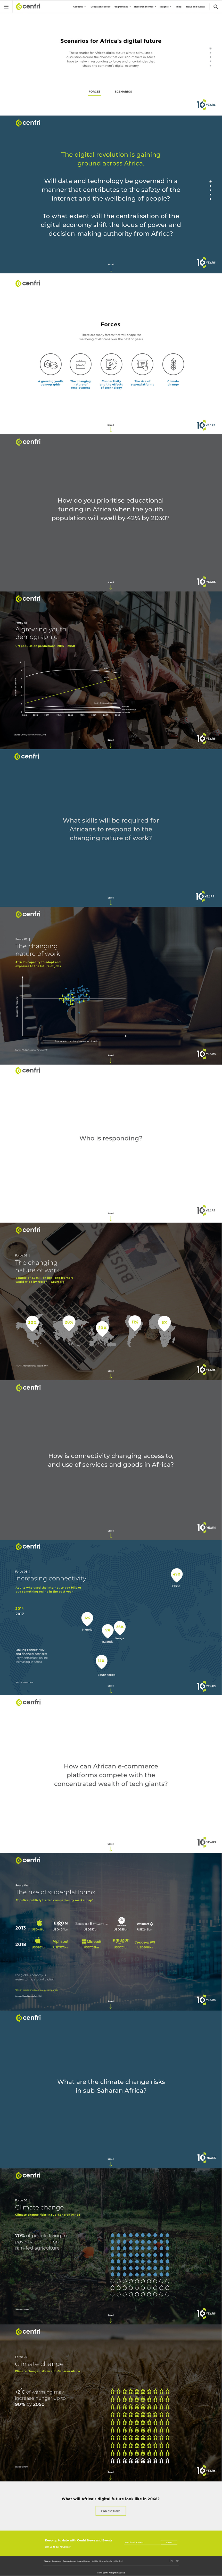 UI ux Web Design  digital future Global africa innovation parallax interactive infographic